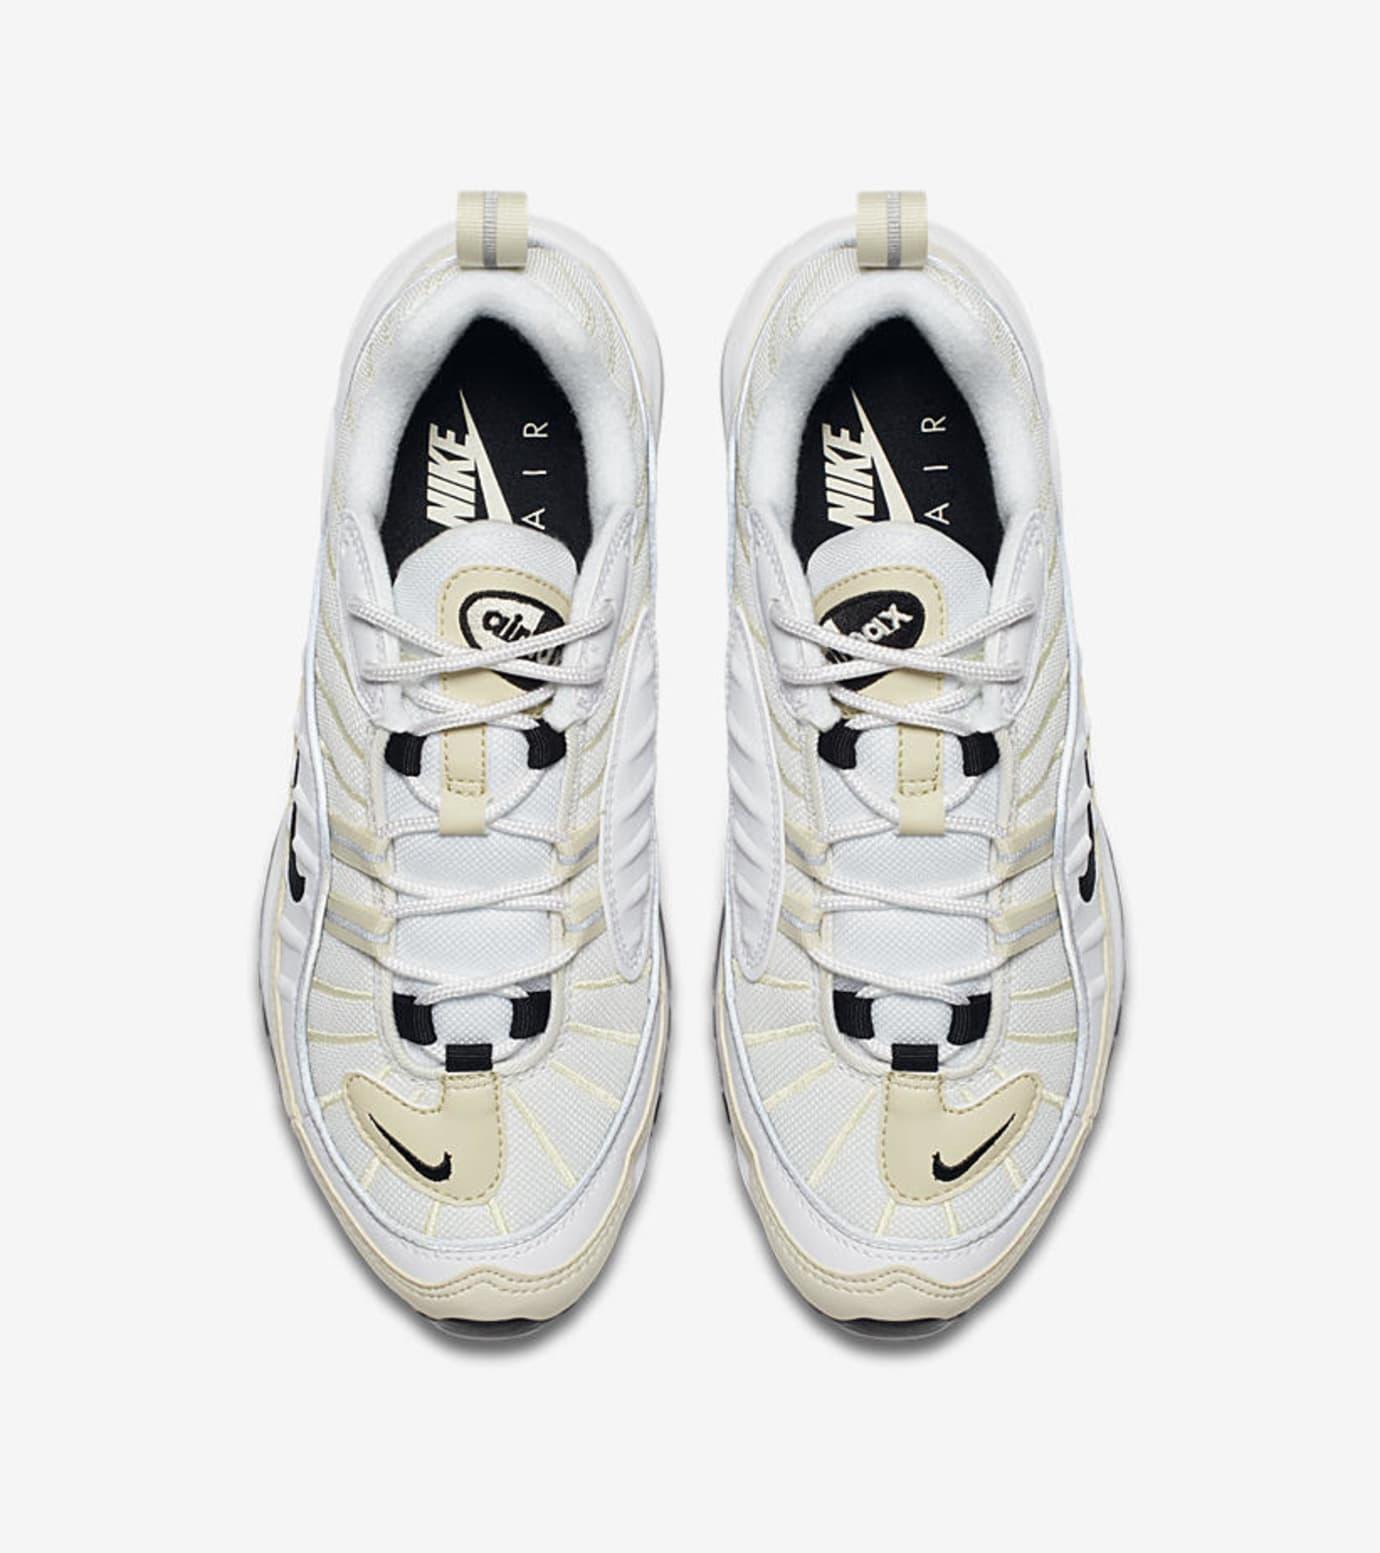 c83c30a71c5716 Image via Nike WMNS Nike Air Max 98  White Black Fossil  AH6799-102 (